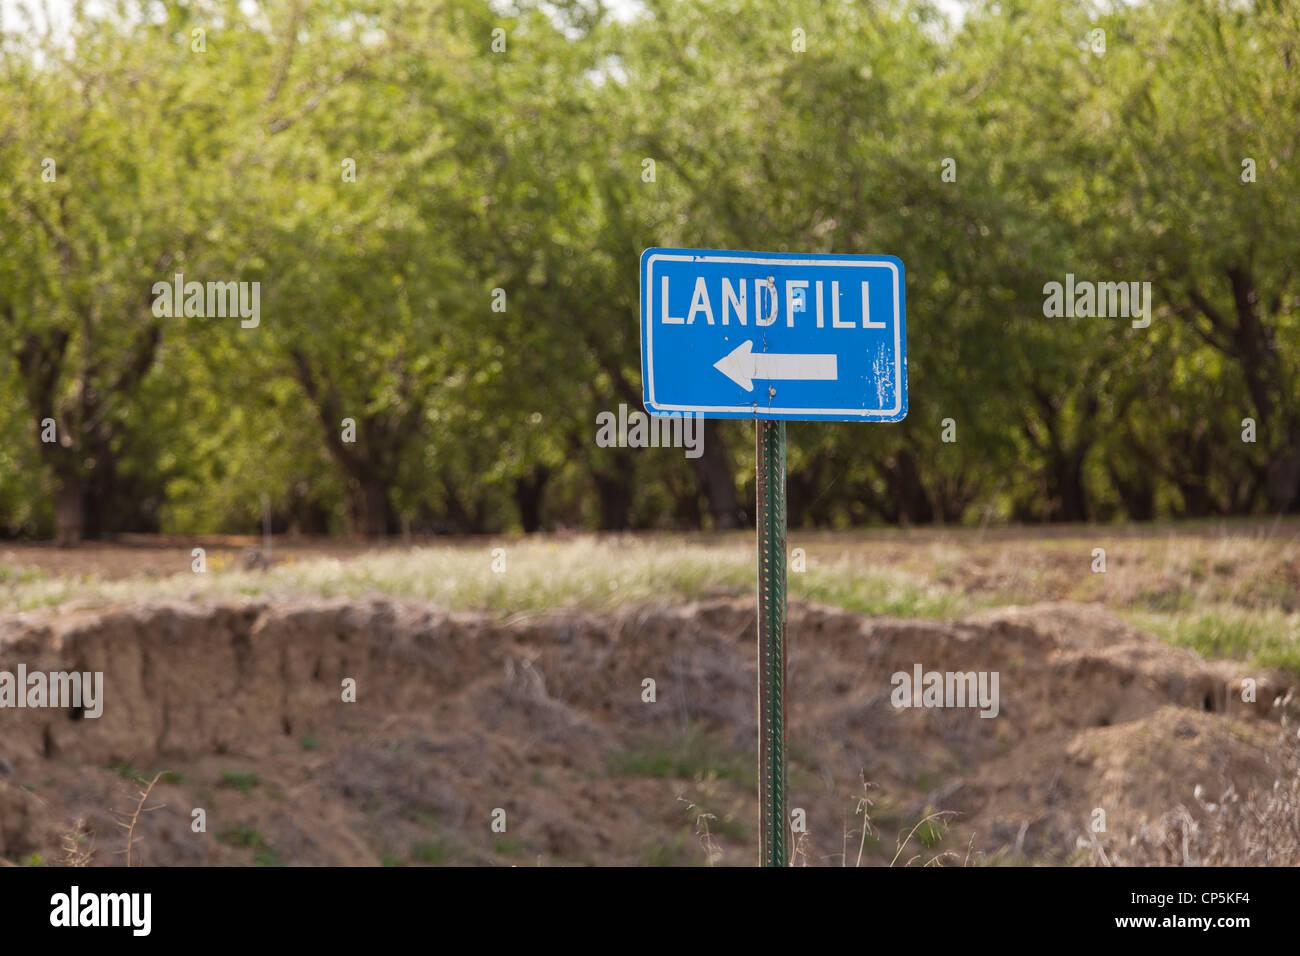 Landfill sign - USA - Stock Image